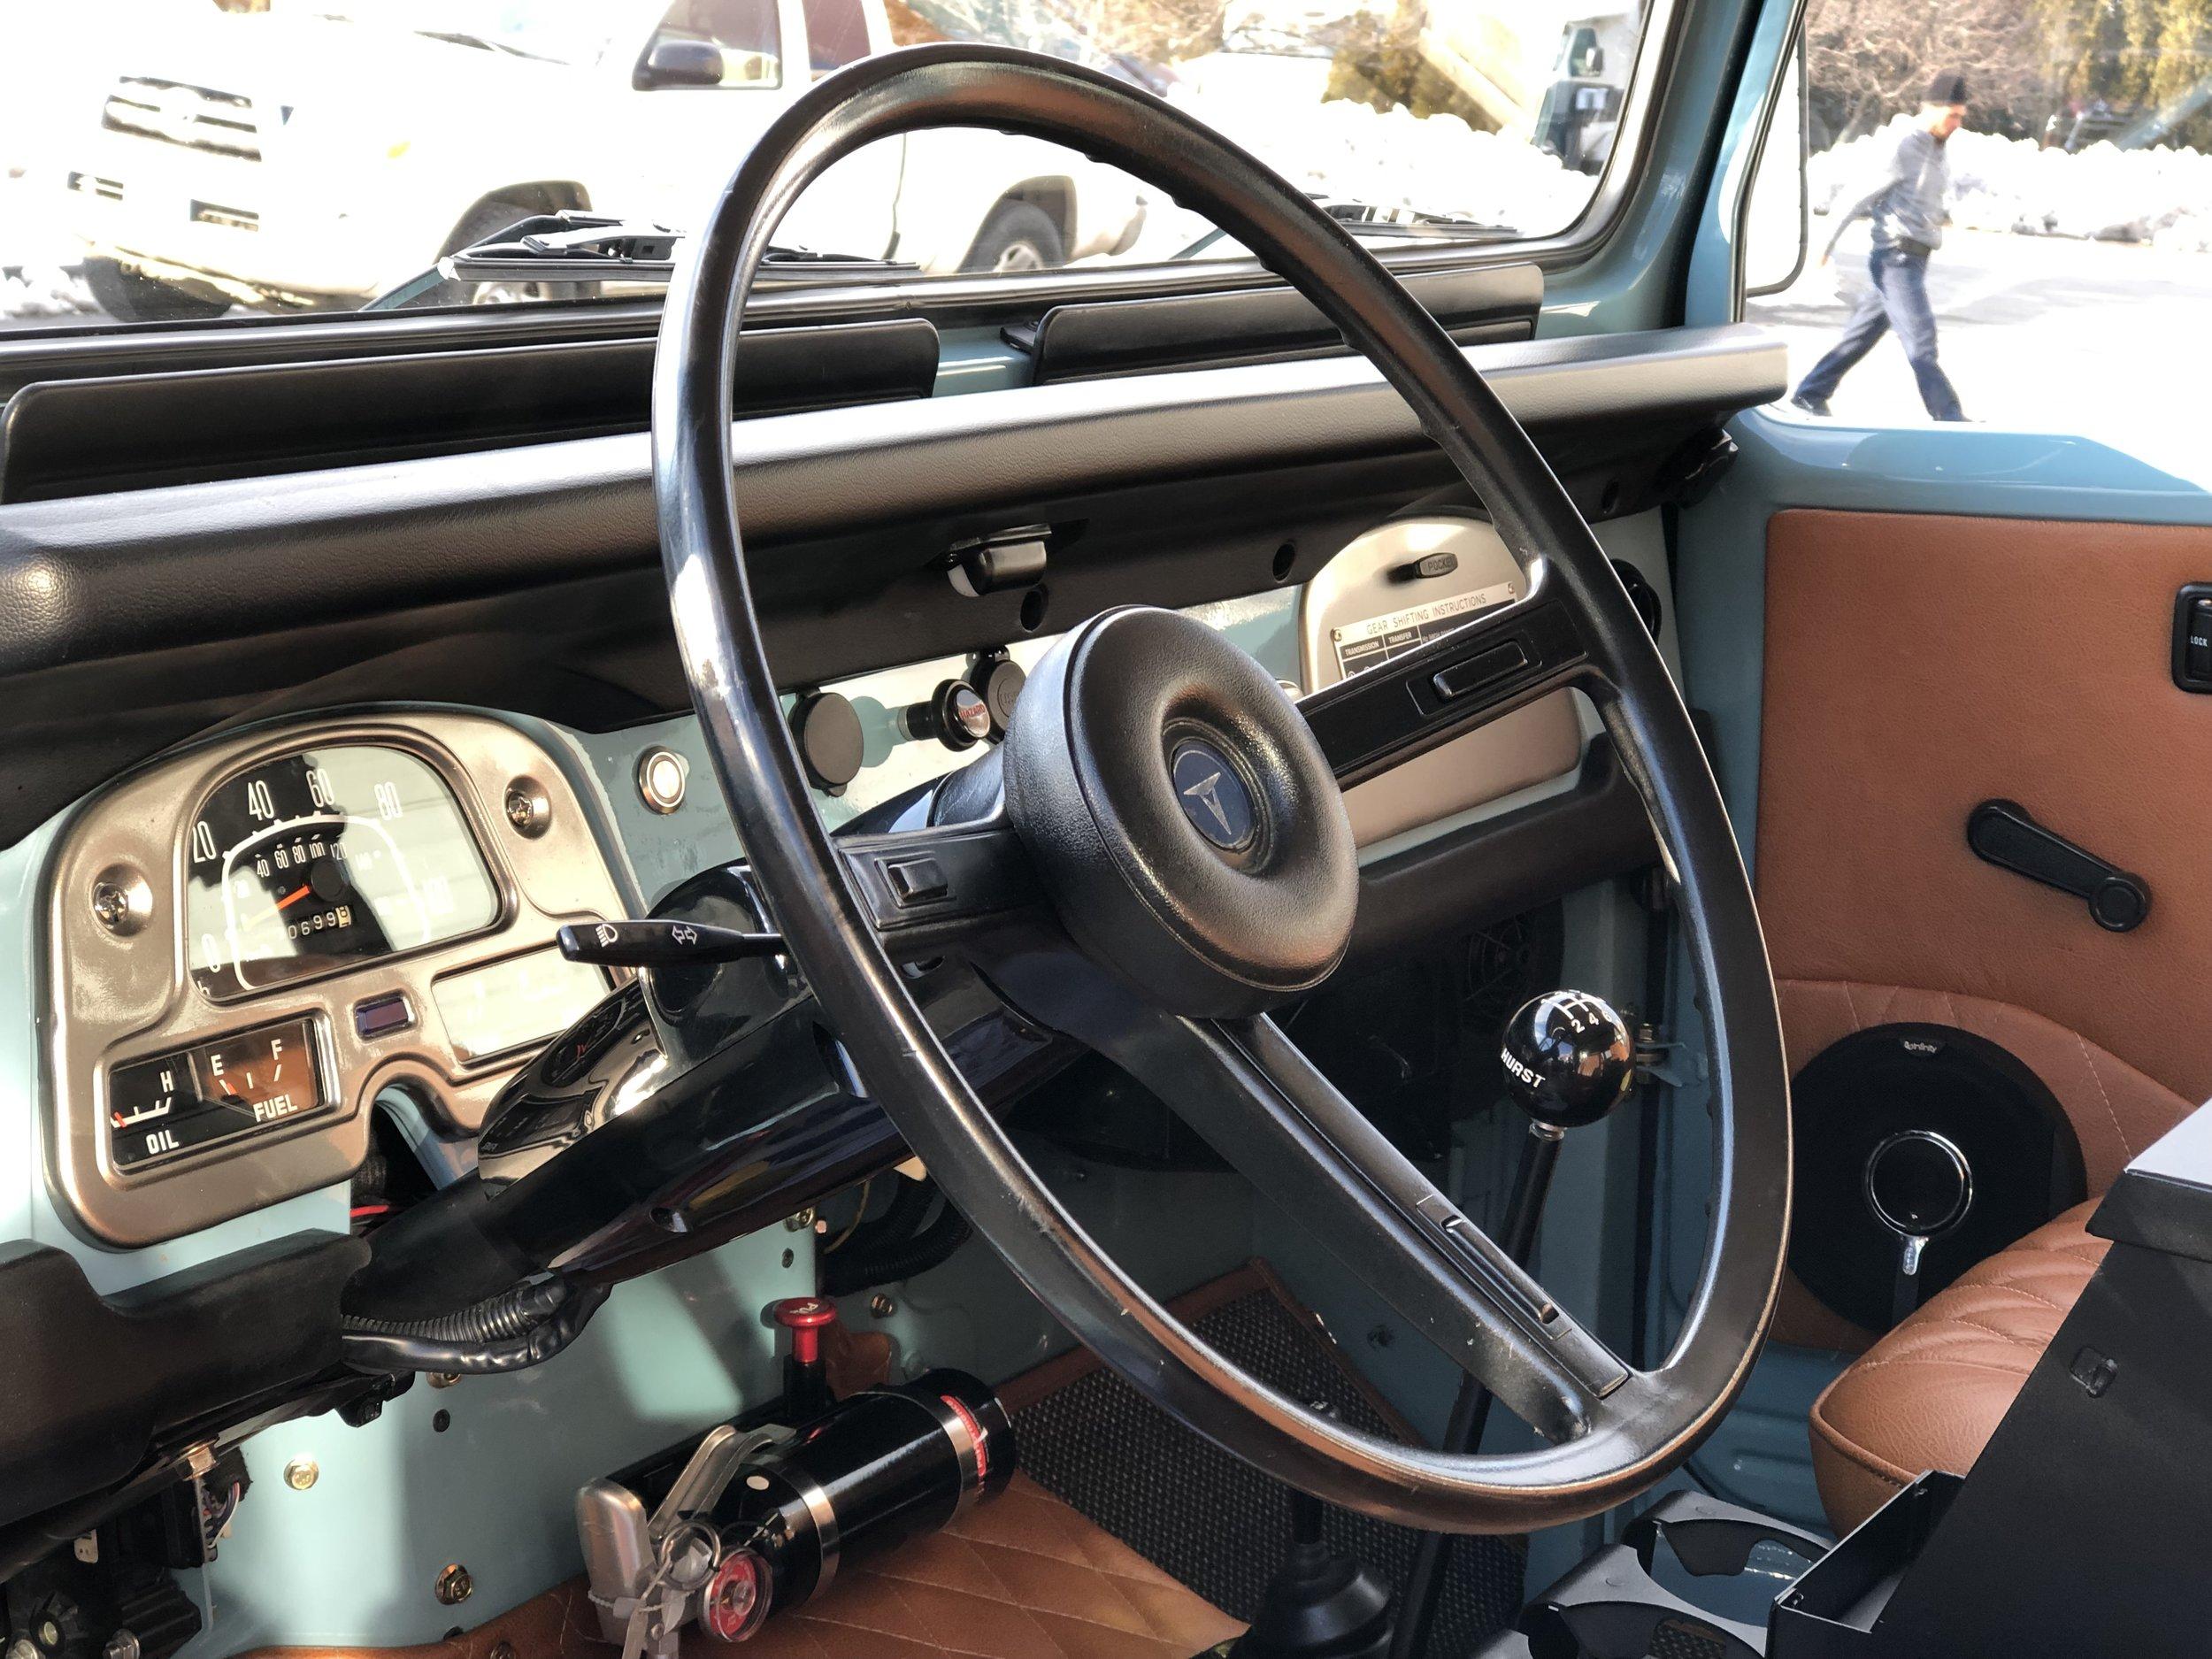 Toyota FJ 40 Interior Detailed.JPG